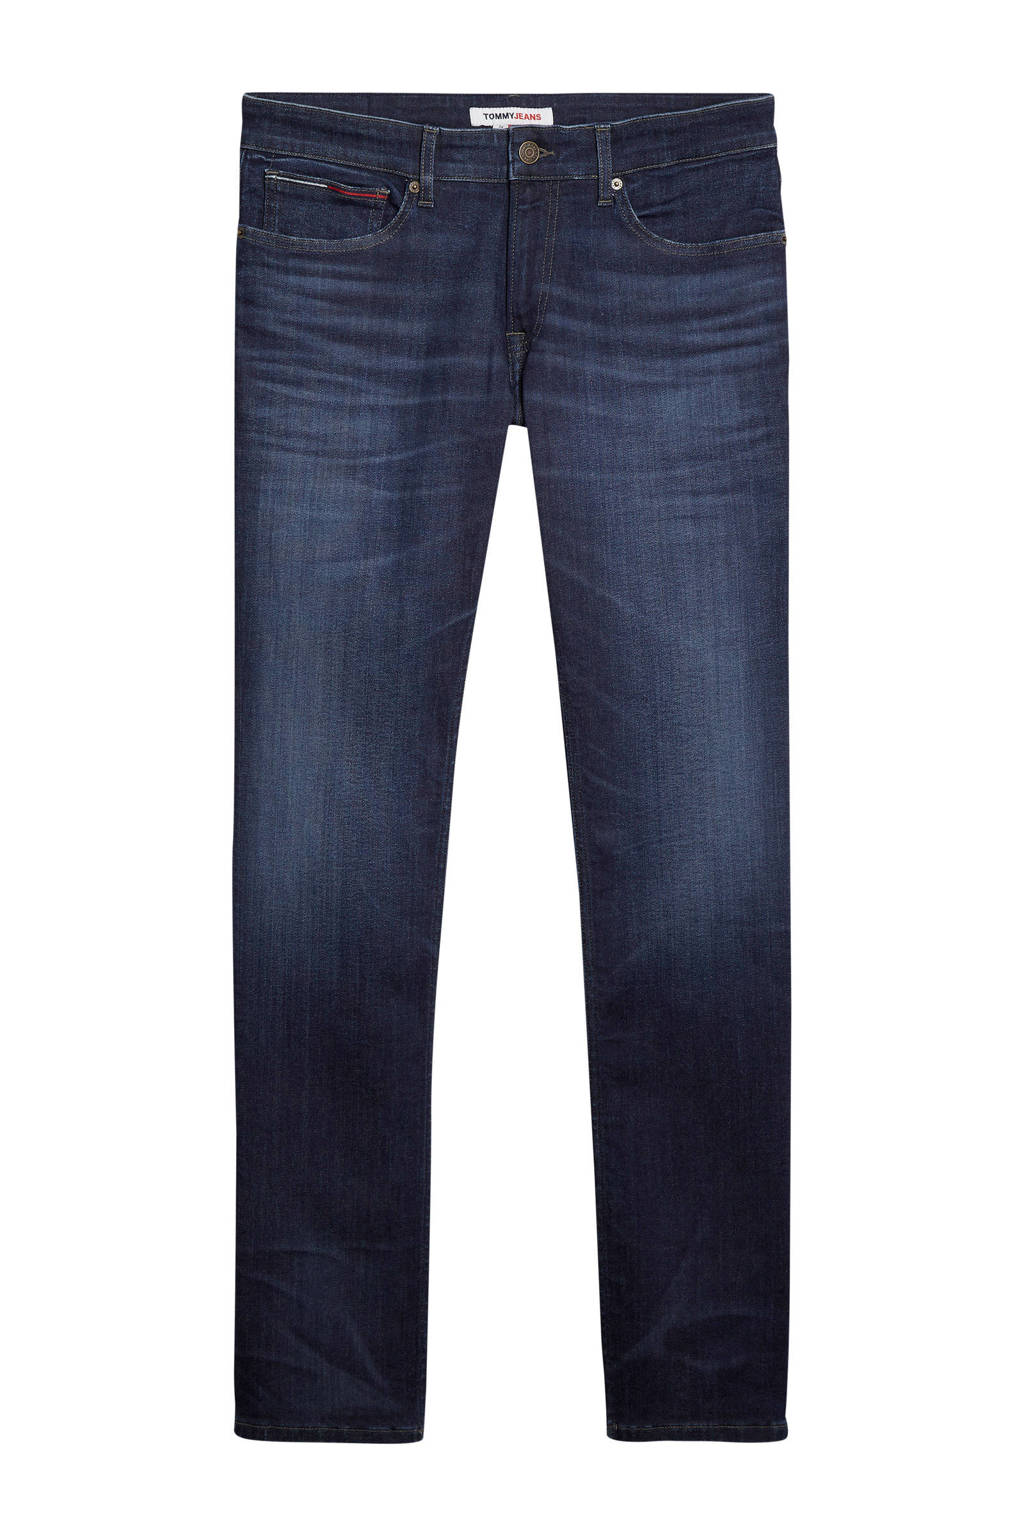 Tommy Jeans slim fit jeans Scanton dark denim, Dark denim